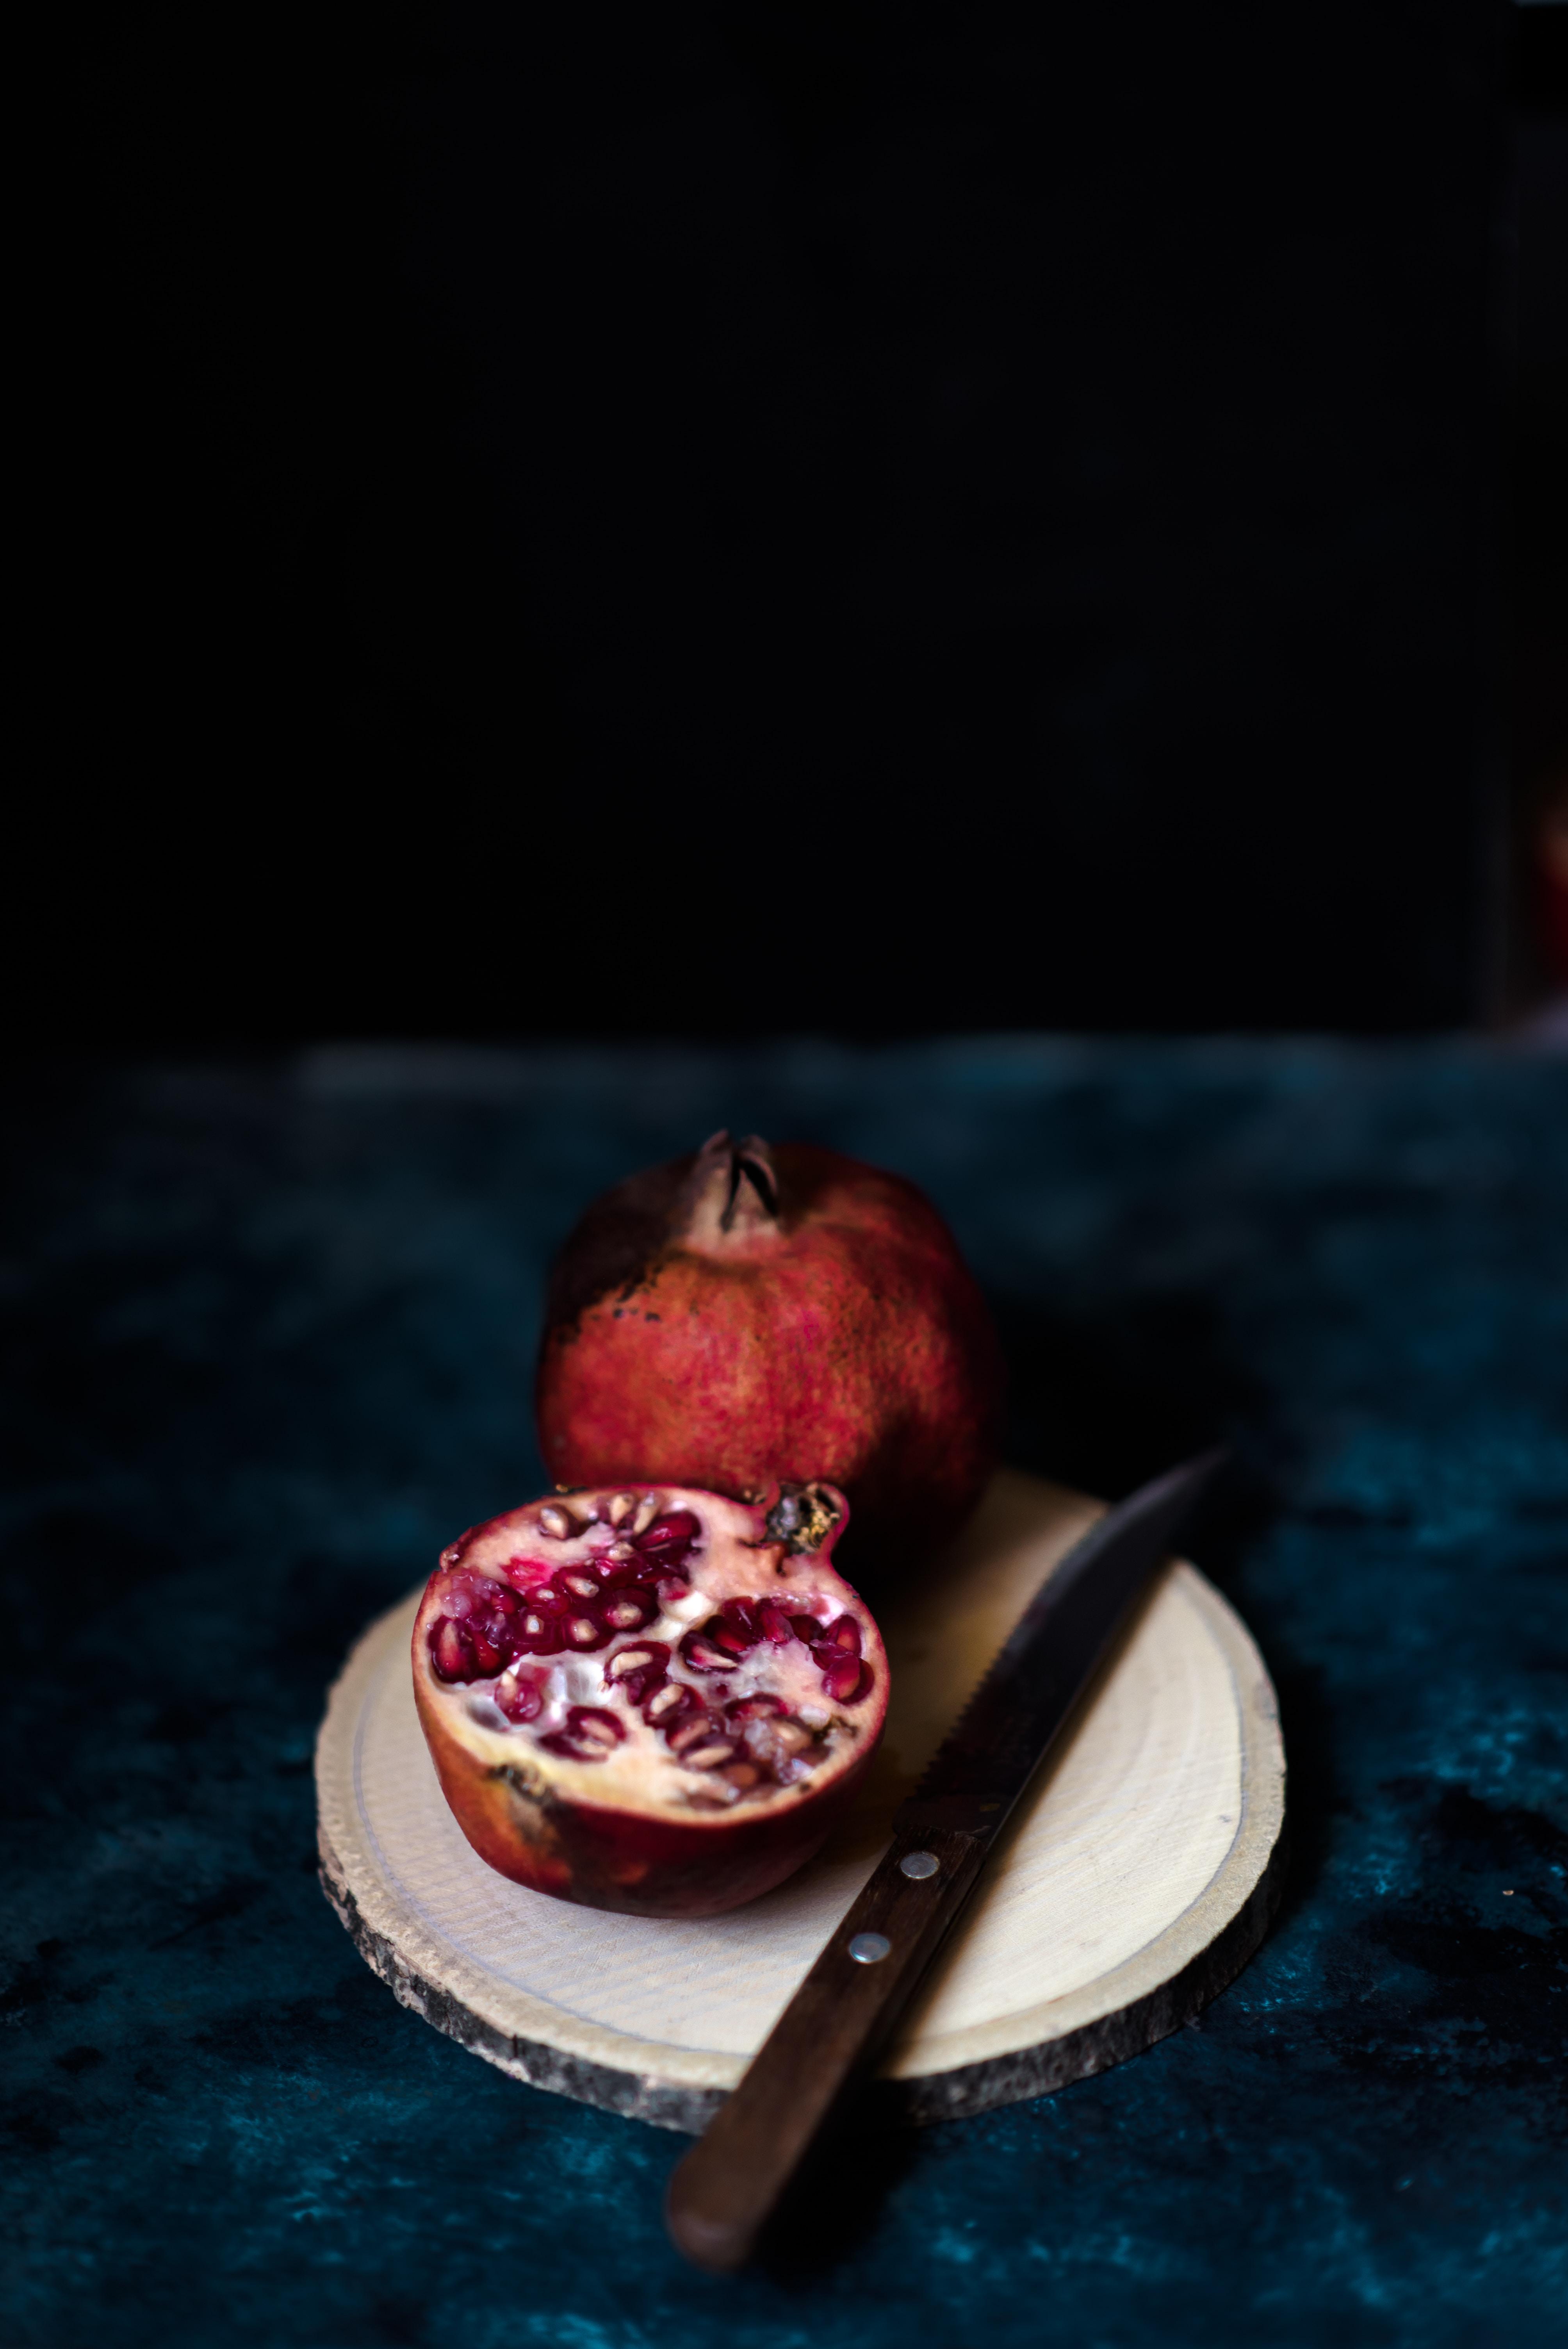 pomegranate on white saucer